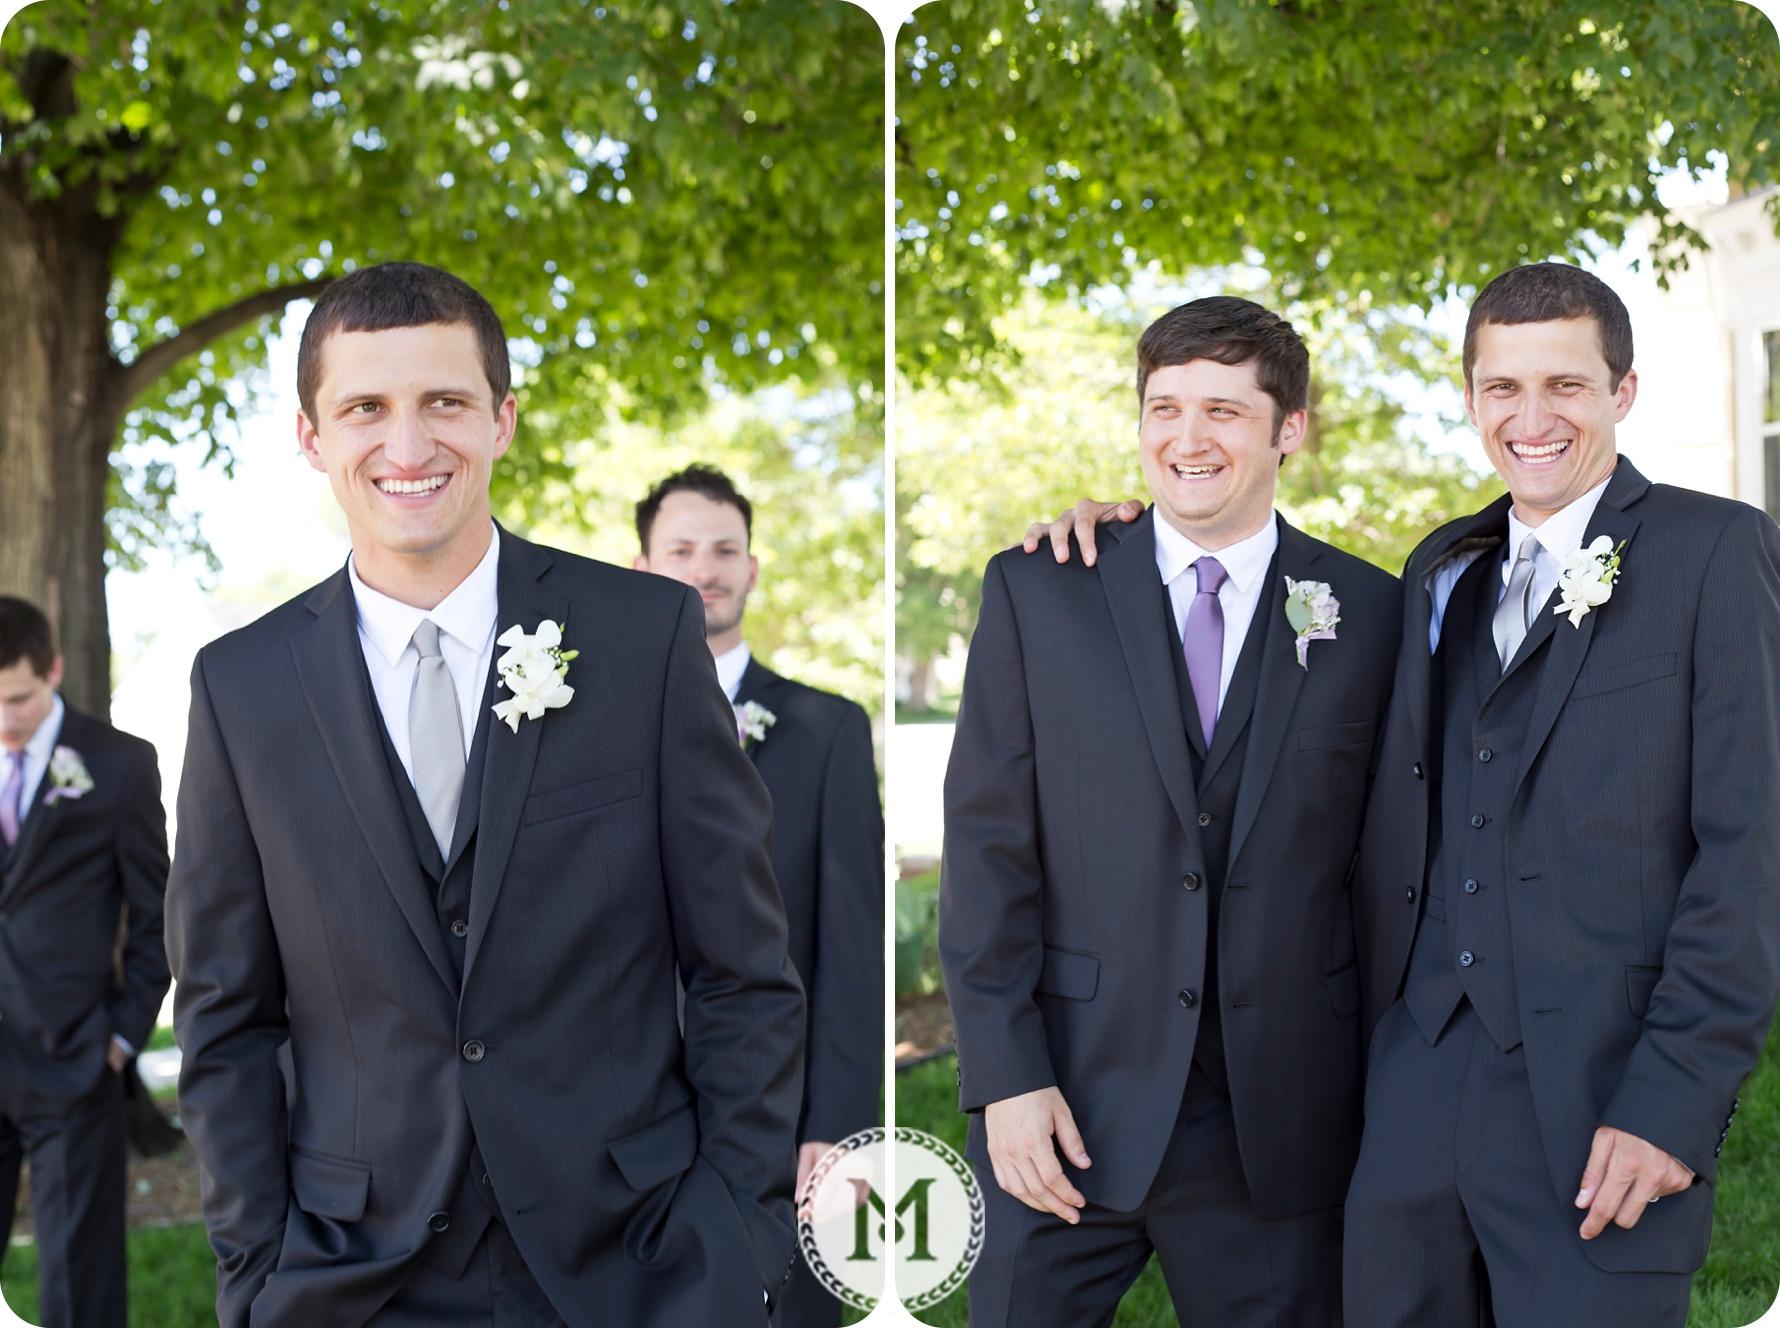 mckenziesmithphotography.com_0362